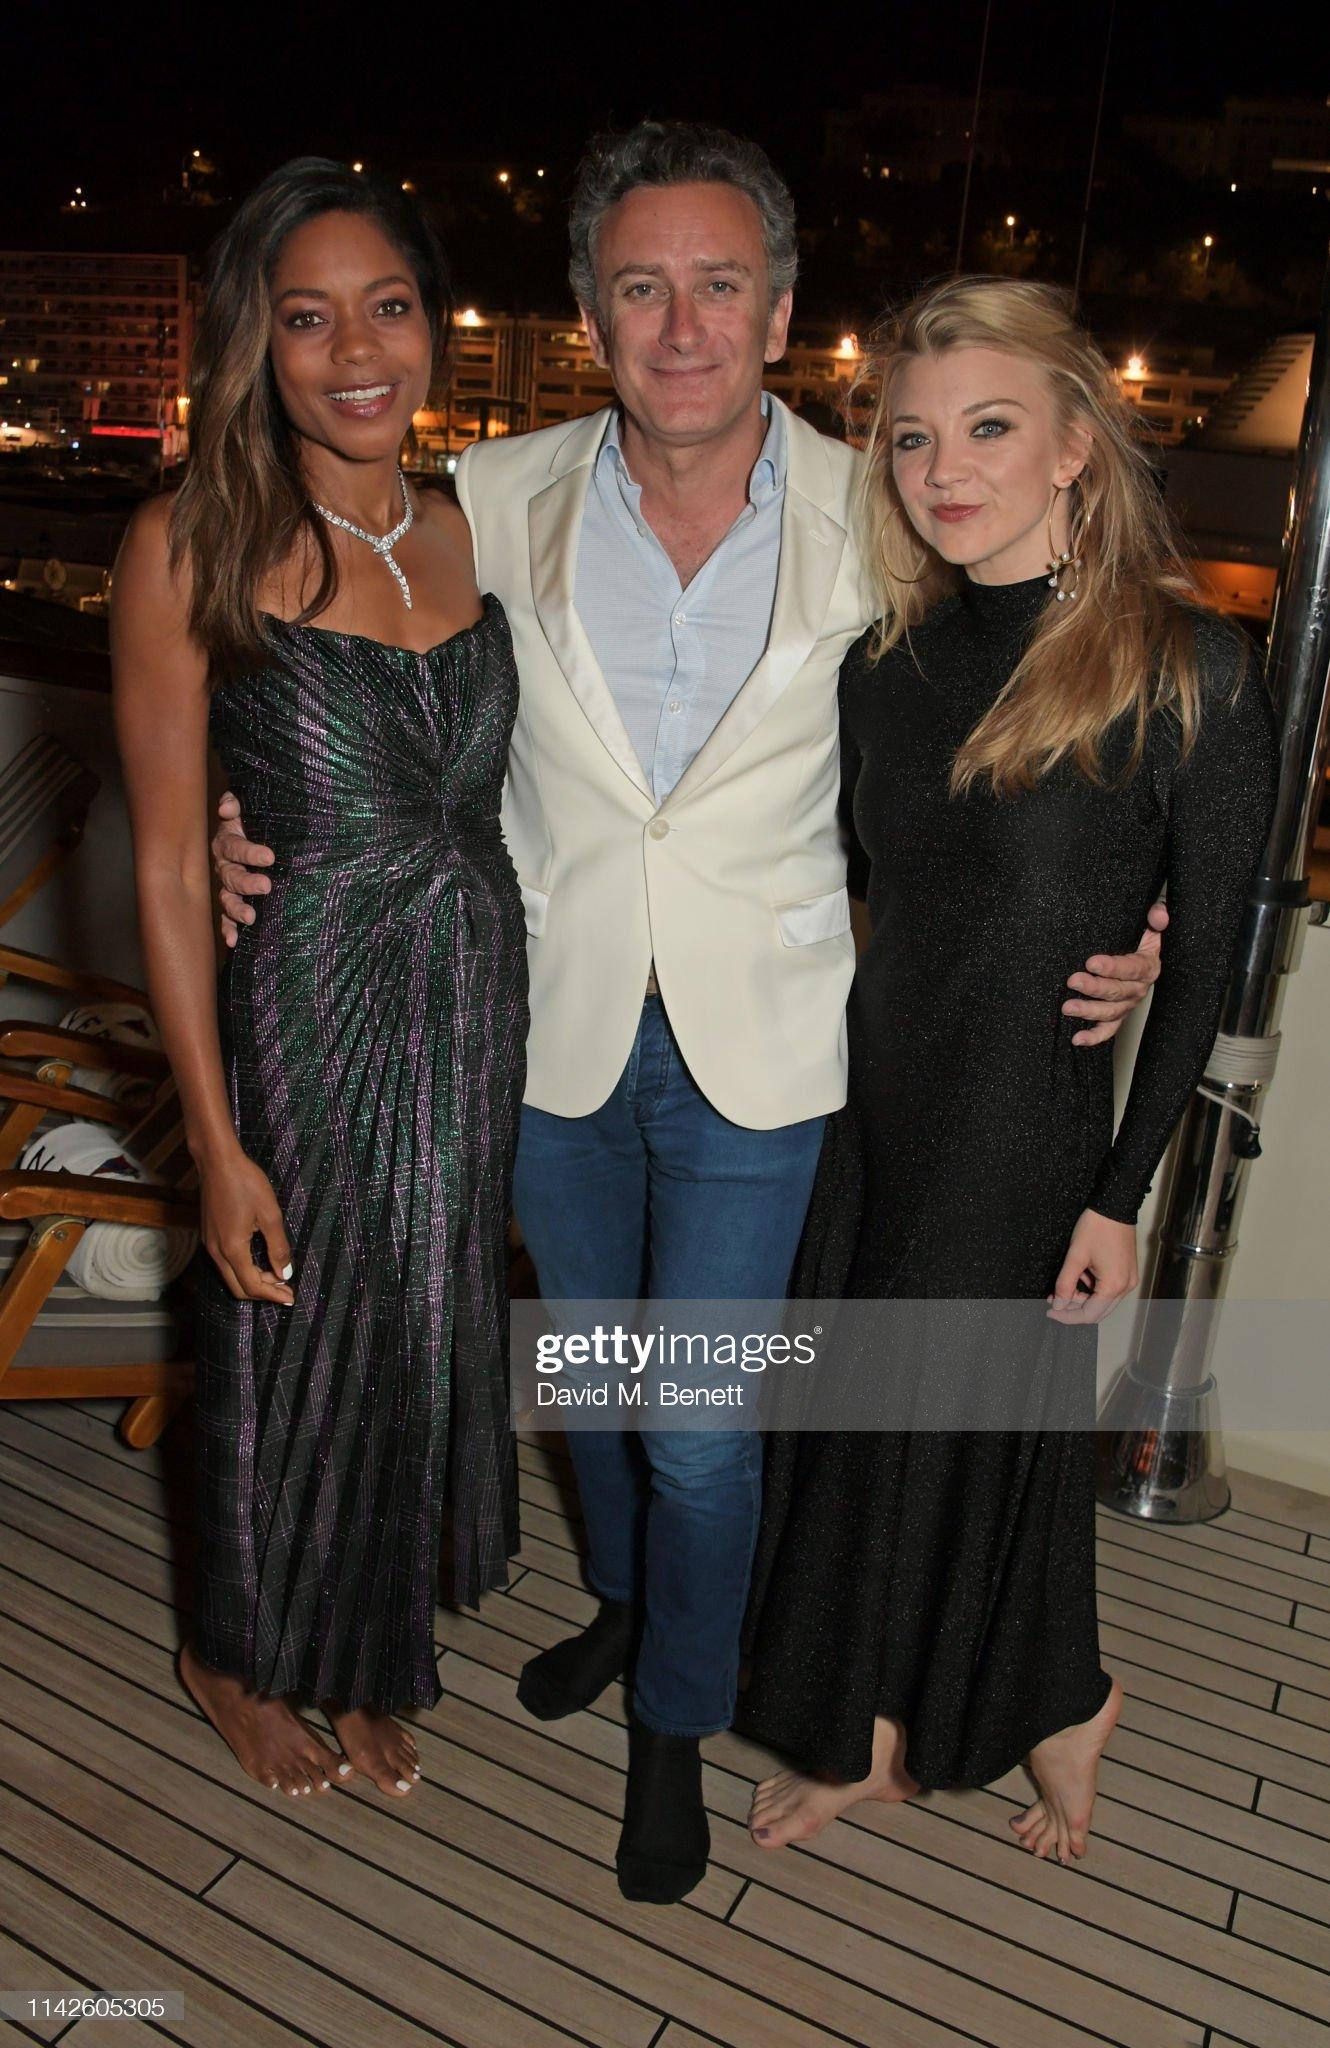 ¿Cuánto mide Naomie Harris? - Real height Naomie-harris-formula-e-ceo-alejandro-agag-and-team-jaguar-guest-picture-id1142605305?s=2048x2048